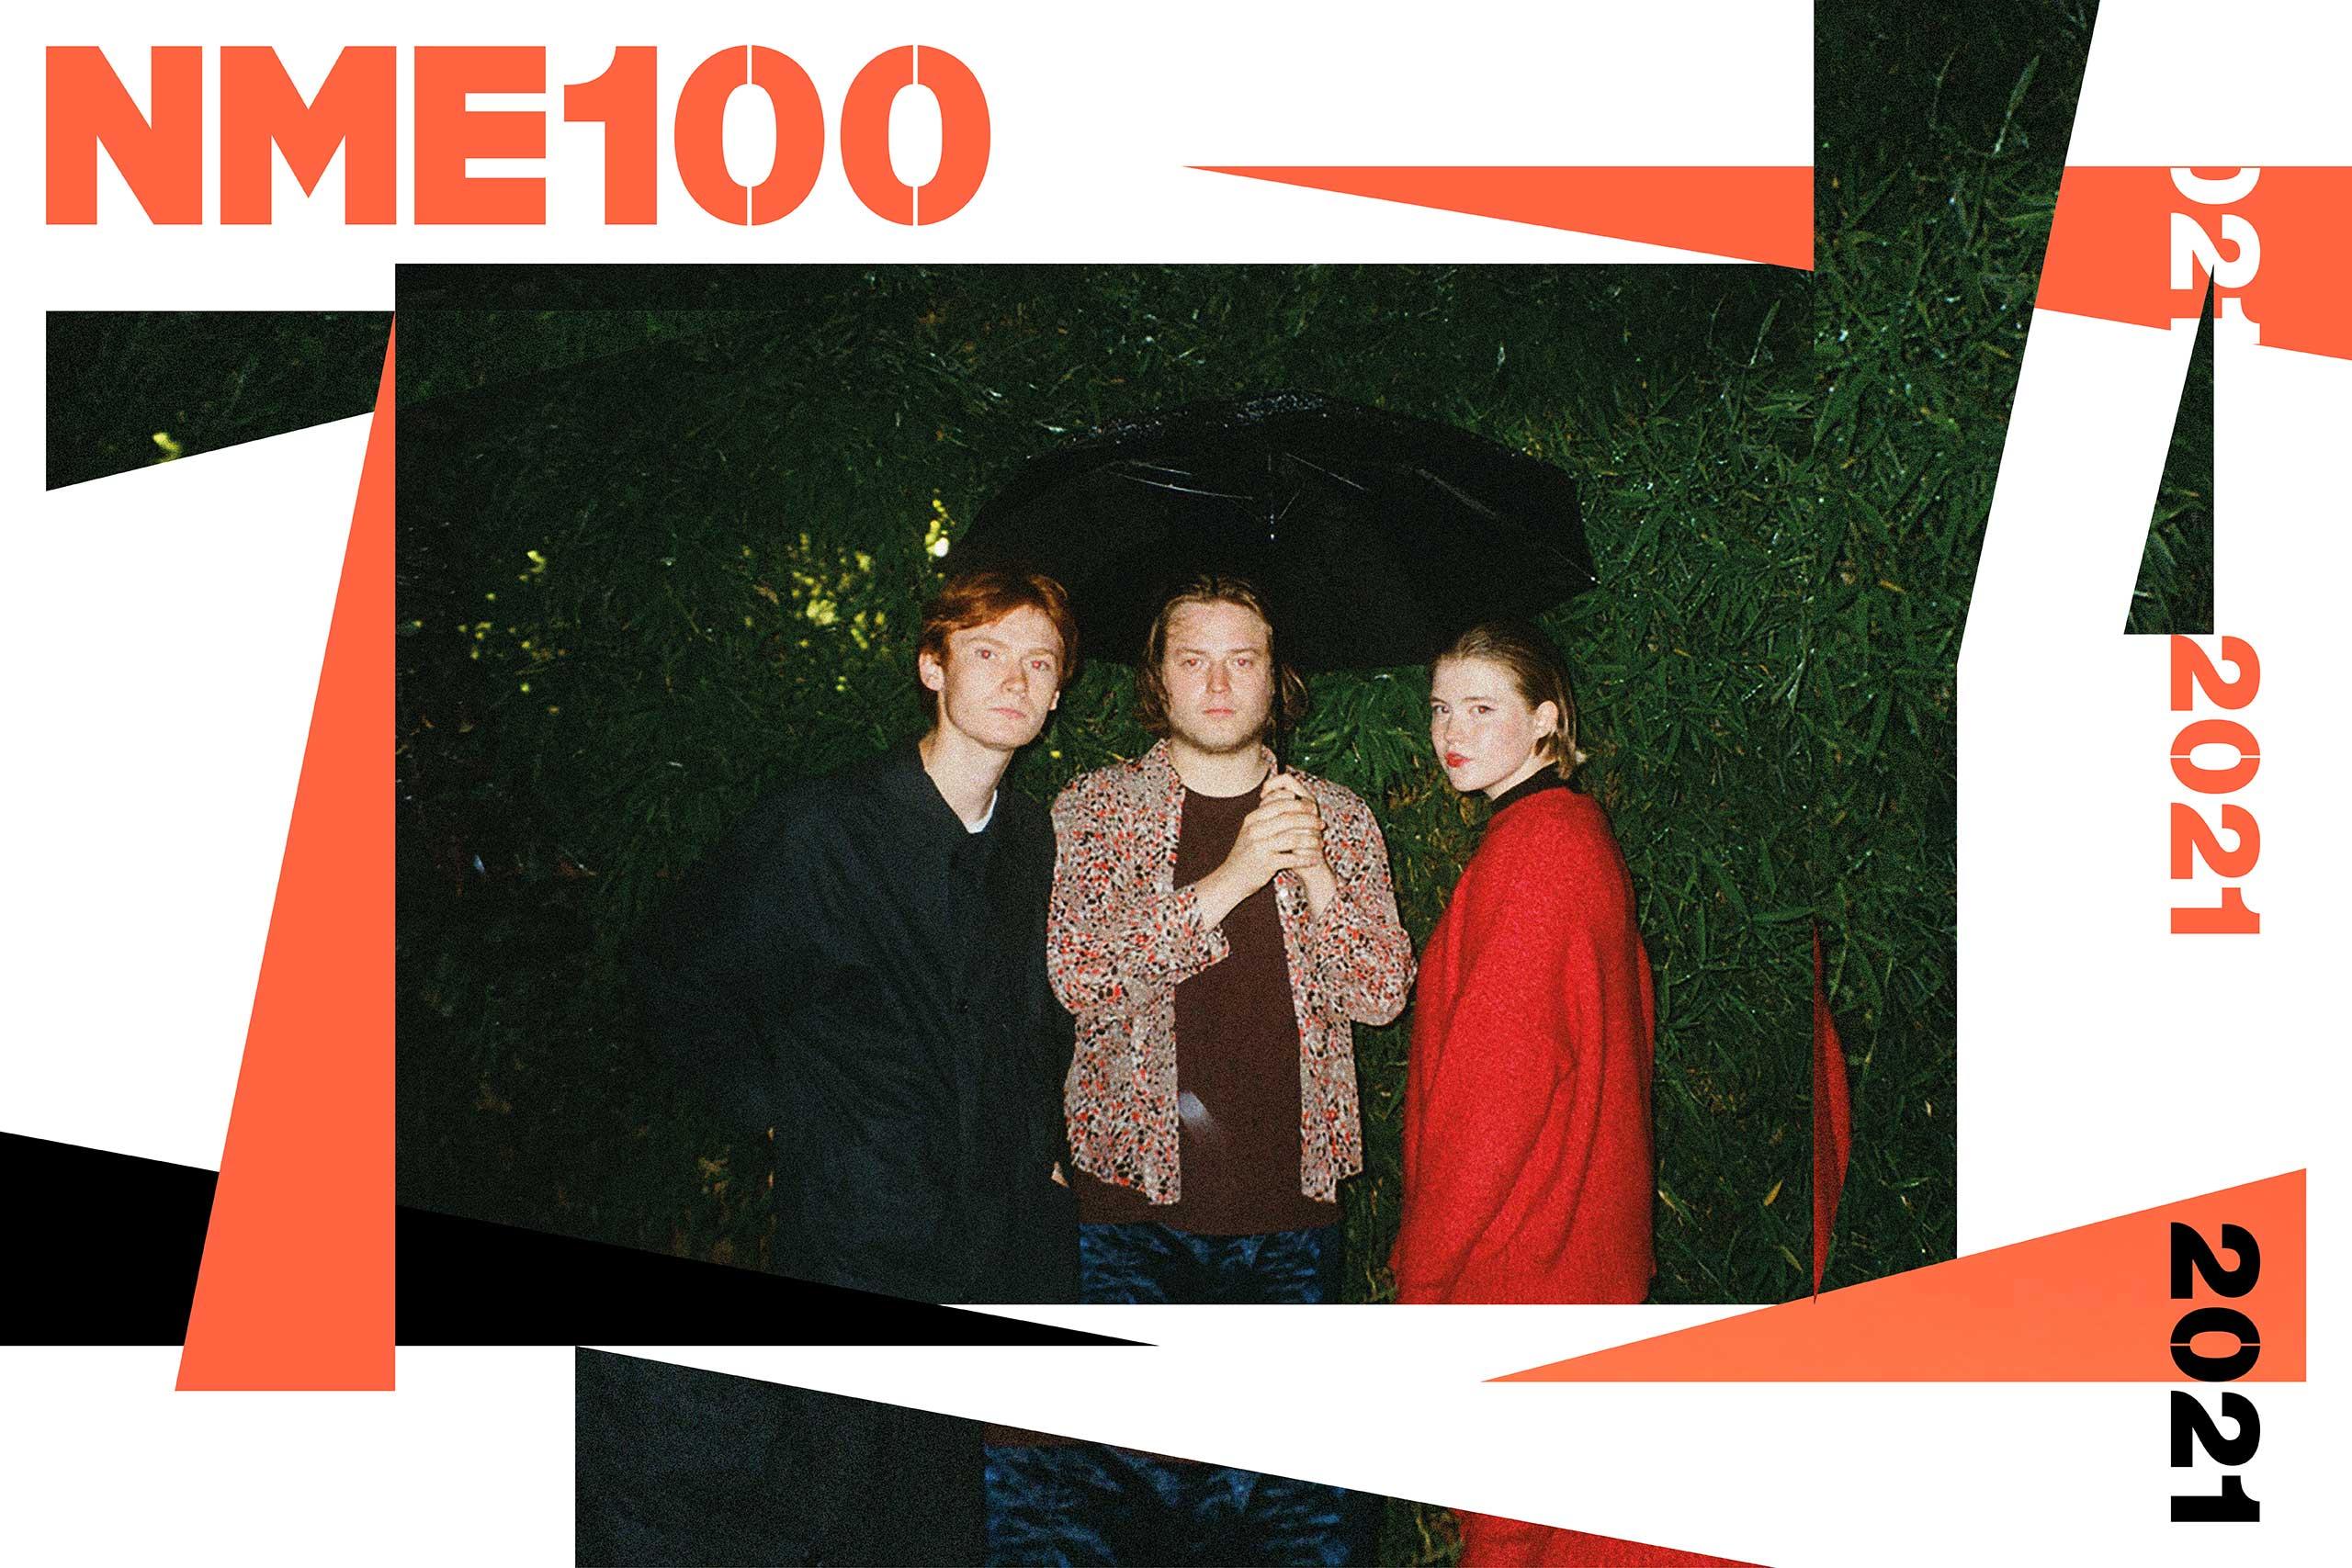 NME 100 pva